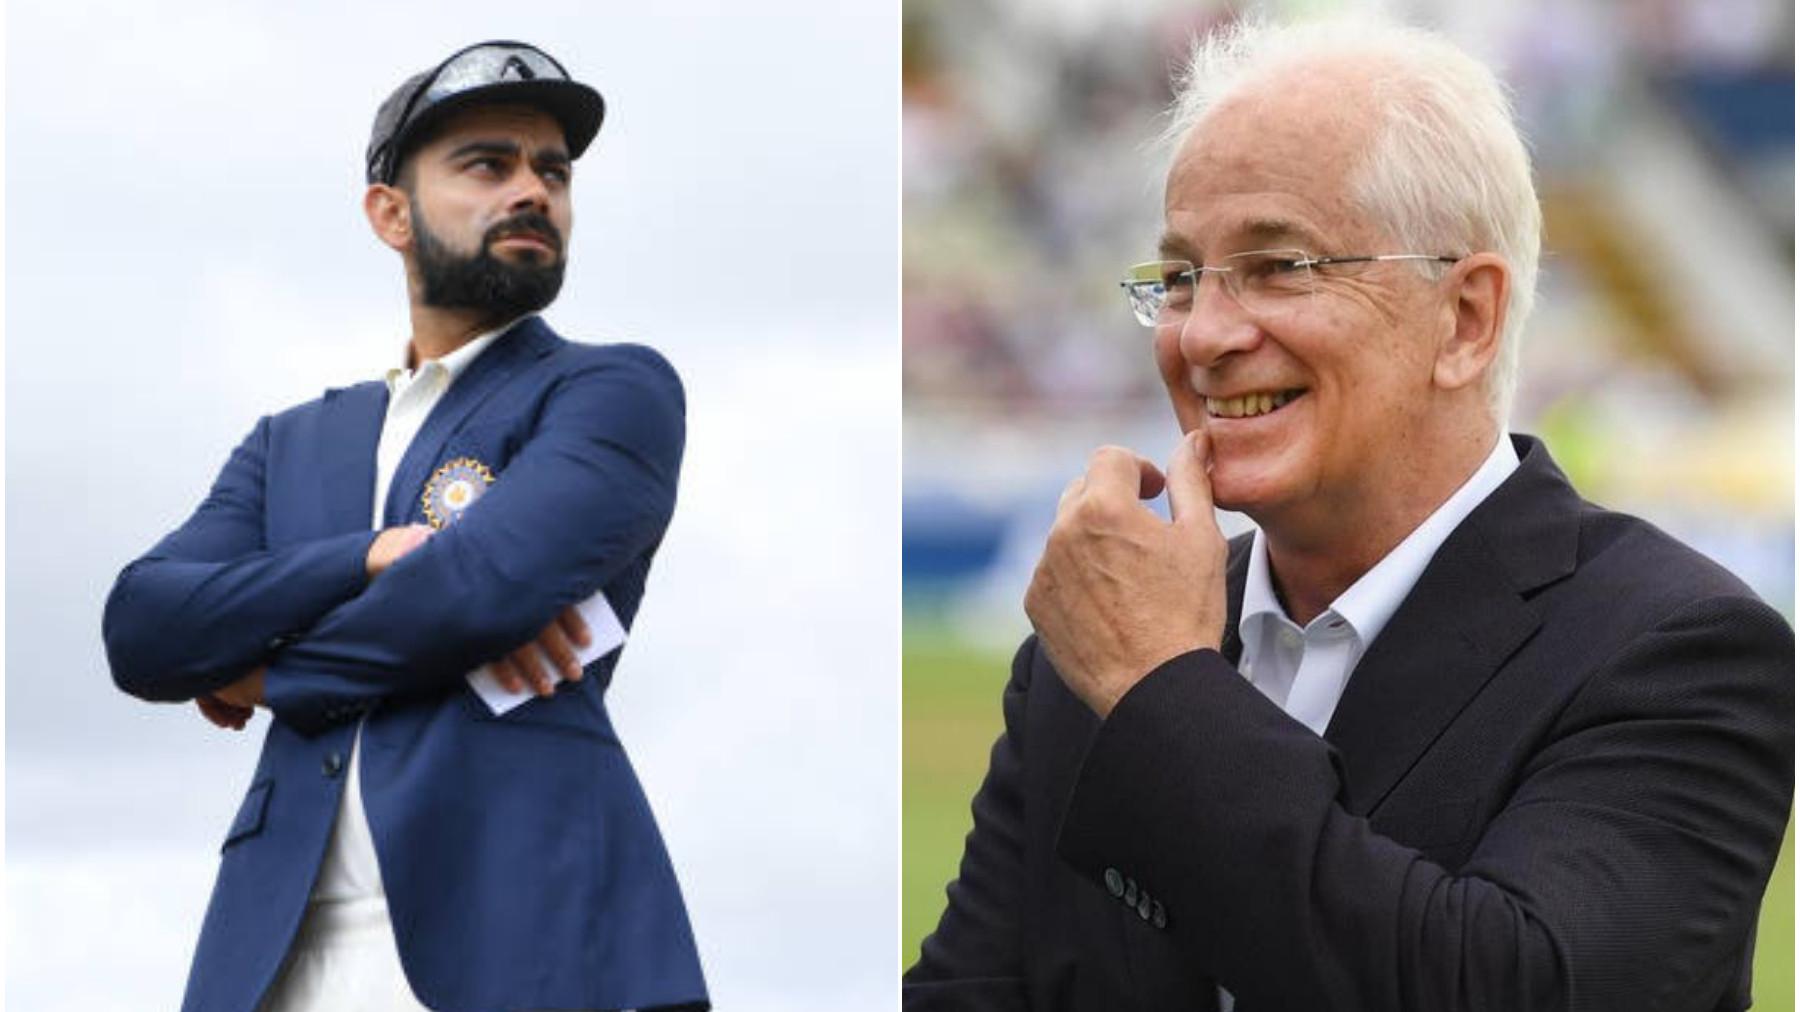 ENG v IND 2021: Virat Kohli e-mailed BCCI at midnight- David Gower claims Indians canceled 5th Test for IPL